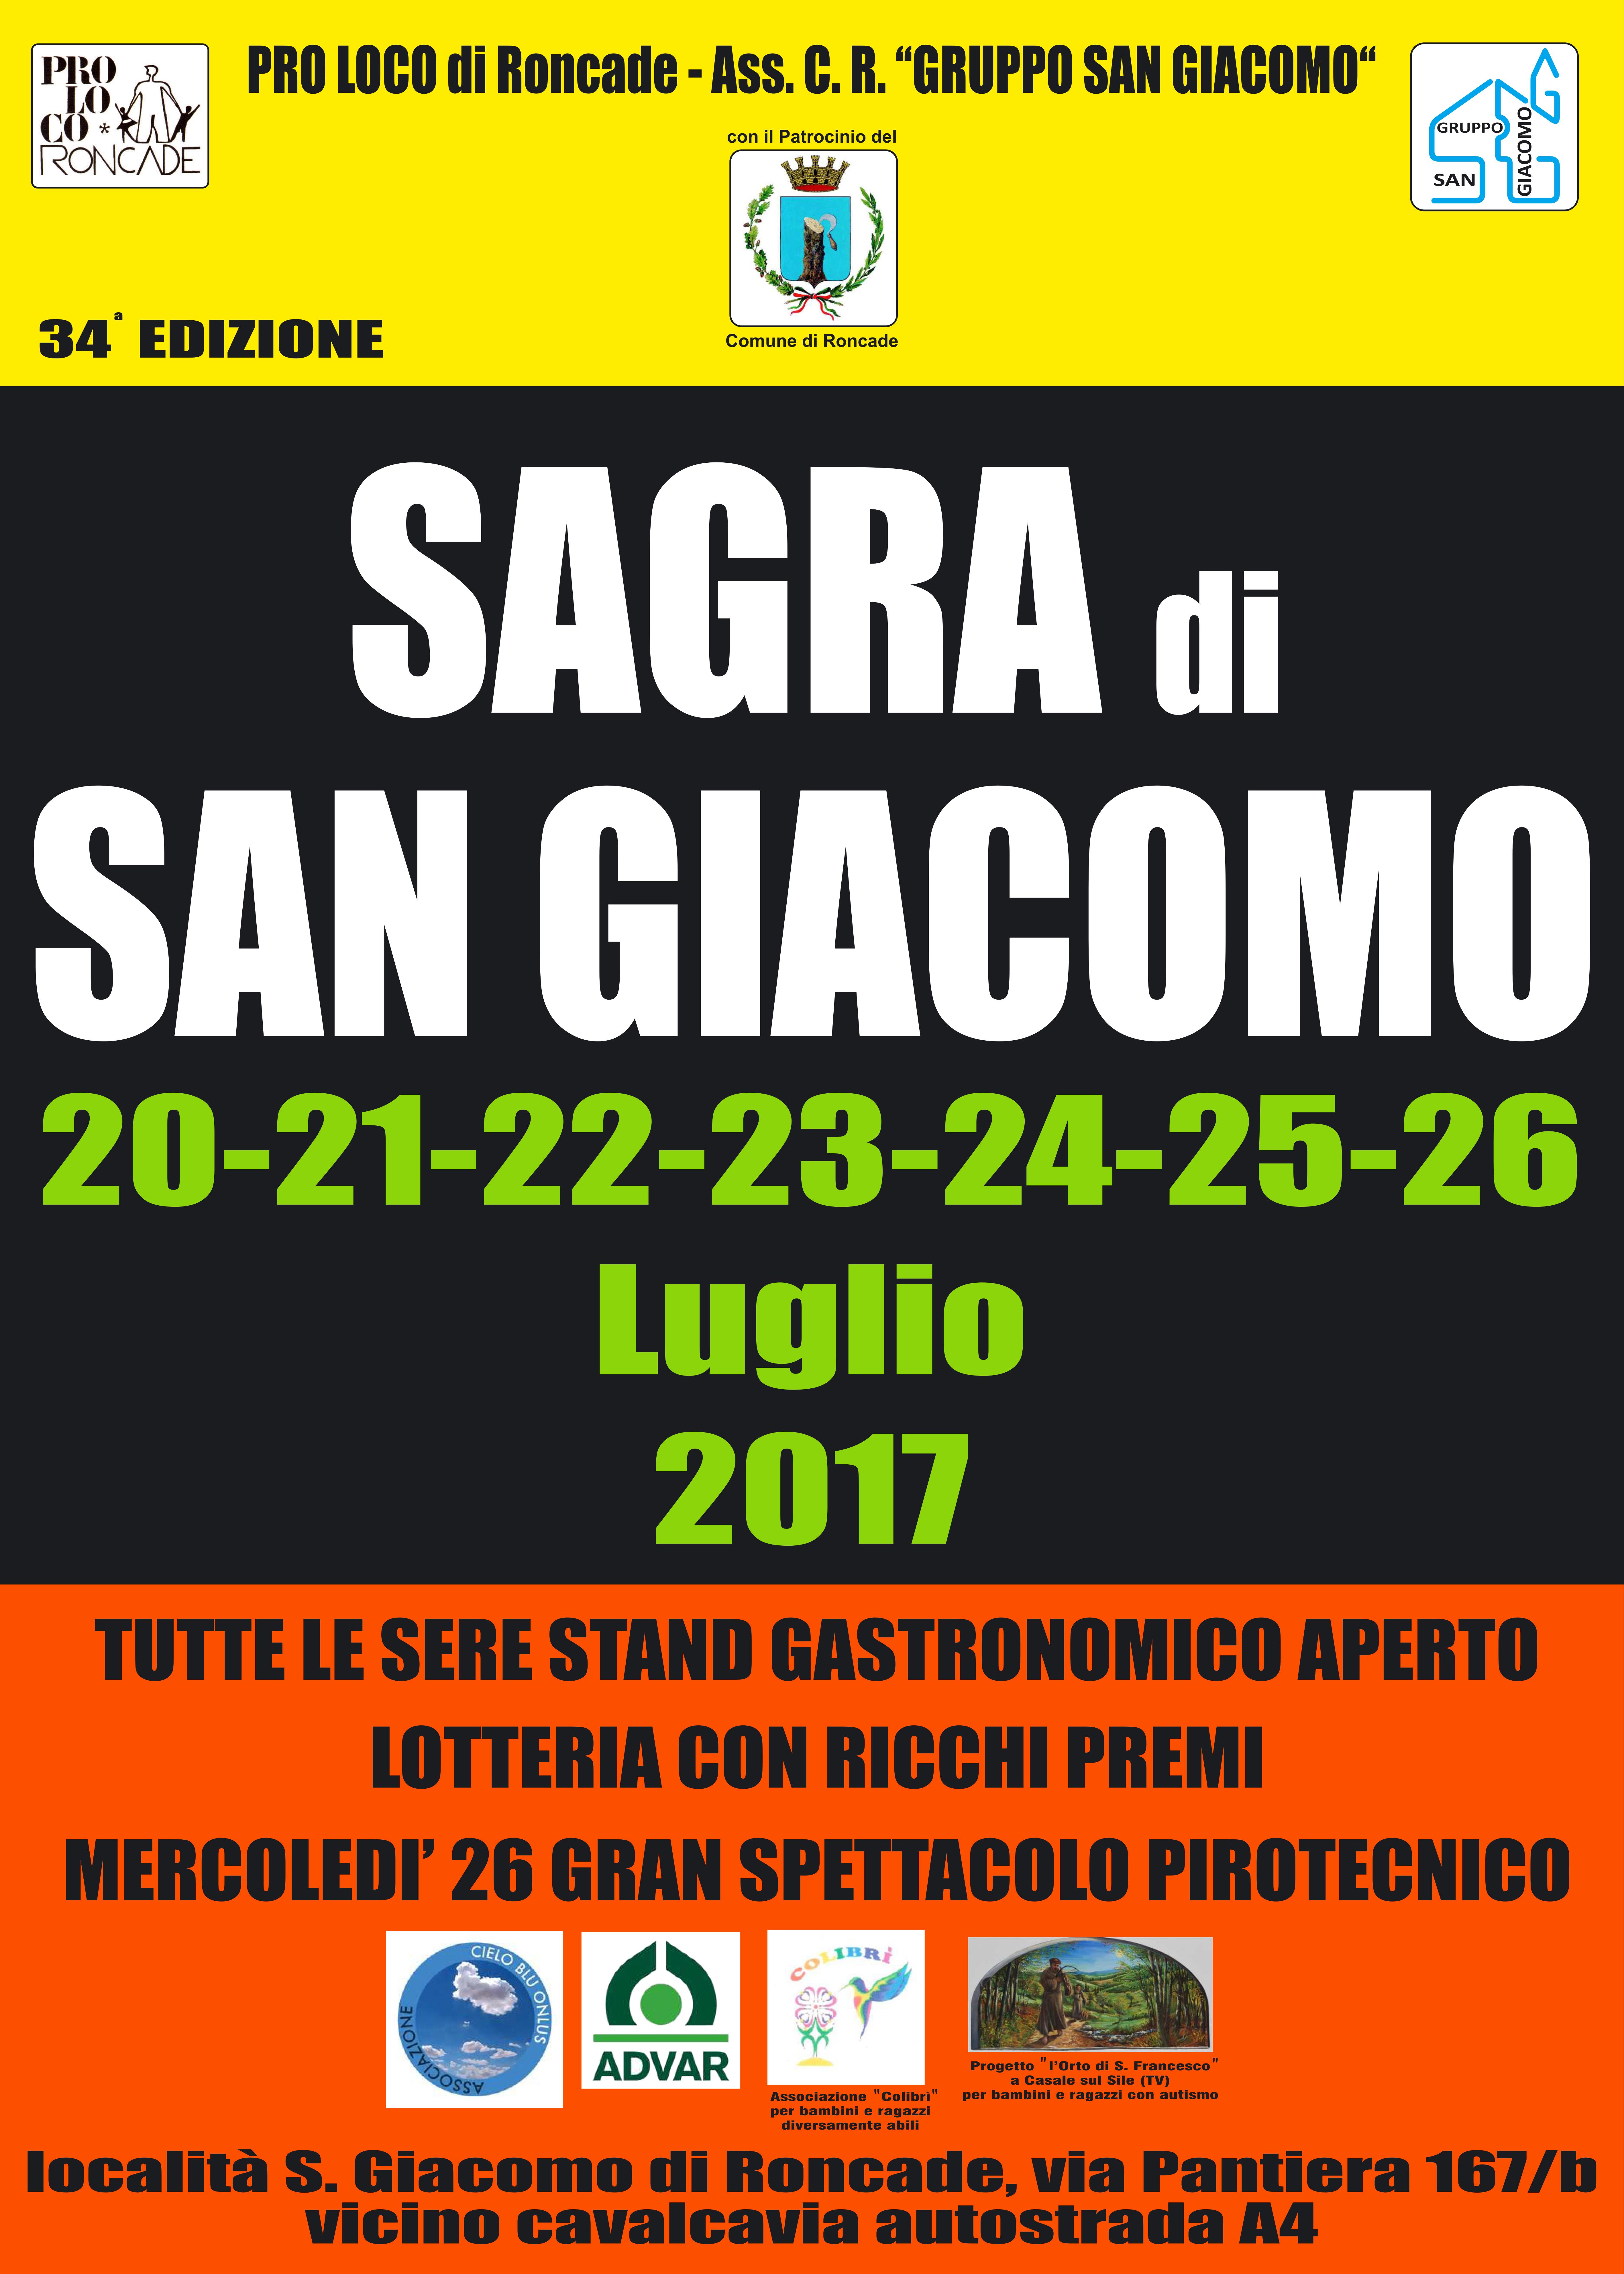 Sagra-San-Giacomo-2017-manifesto-per-strade.jpg